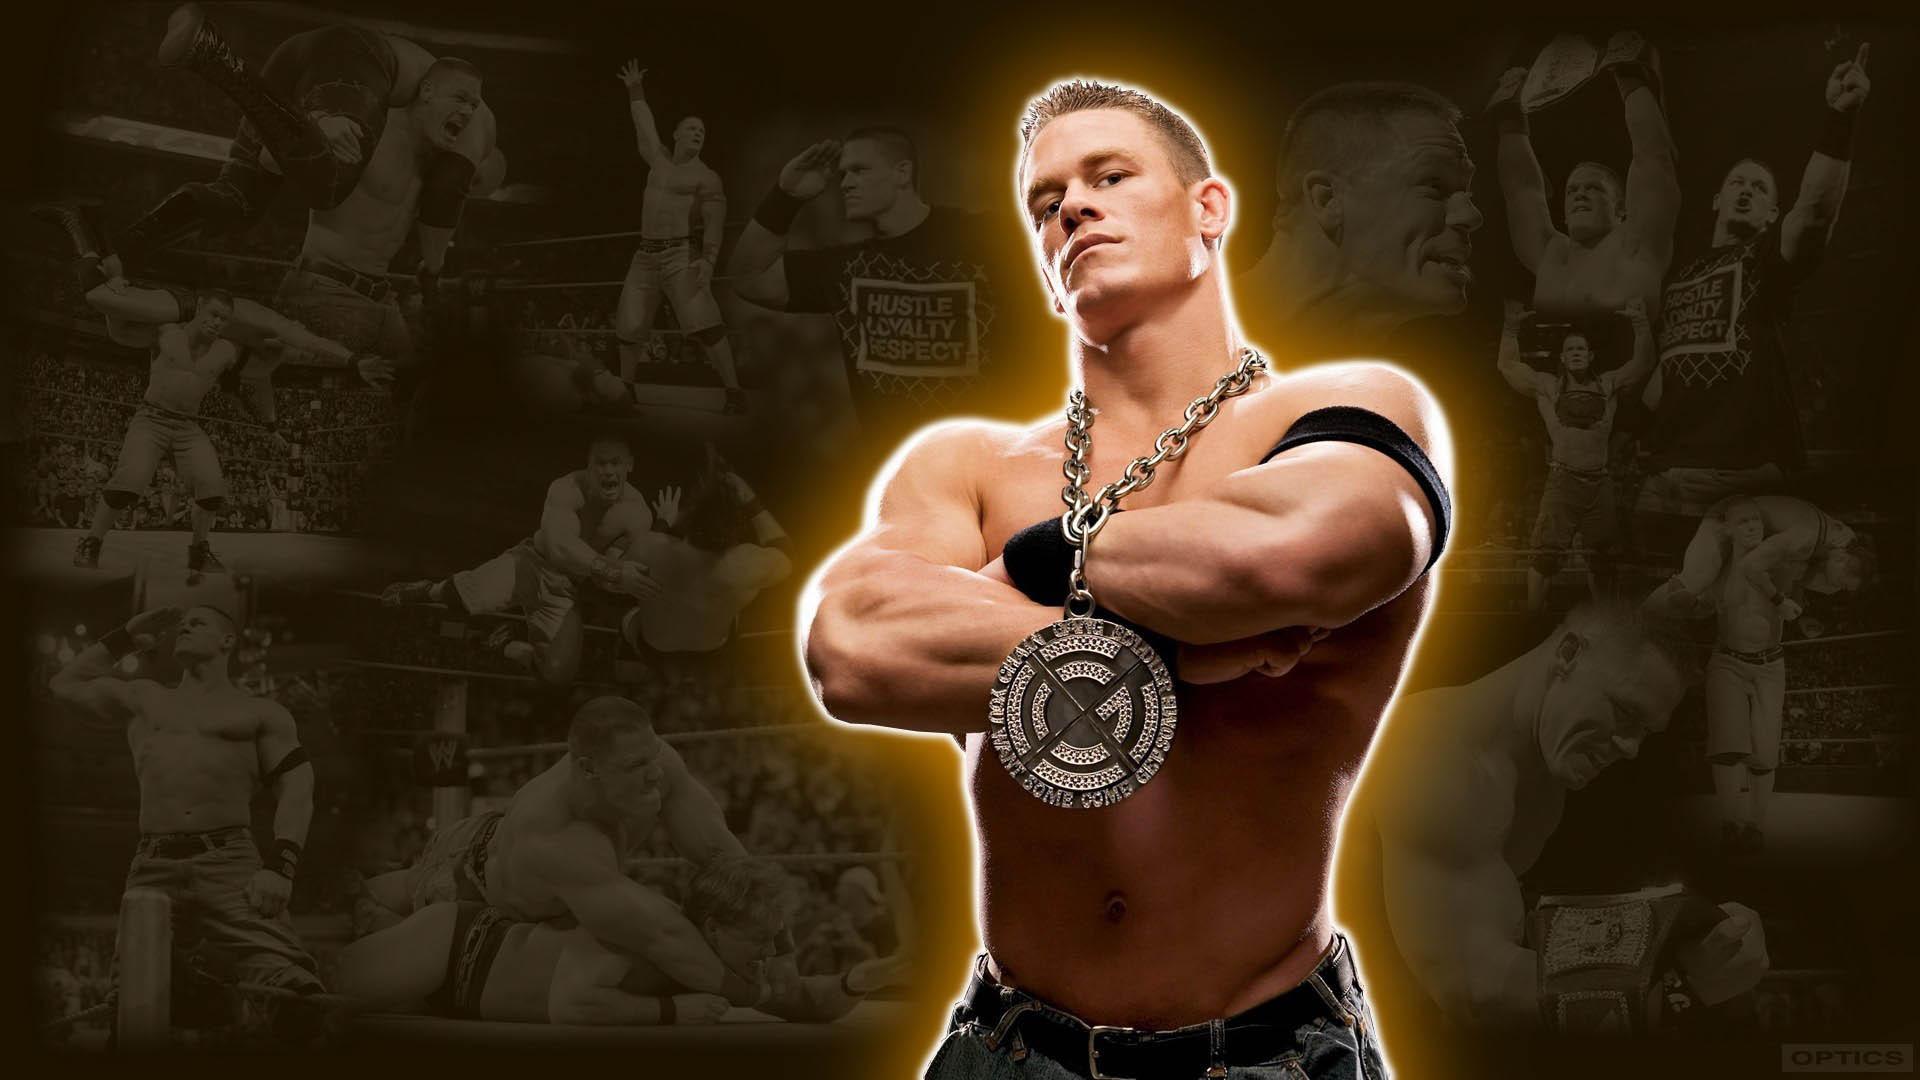 John Cena Background